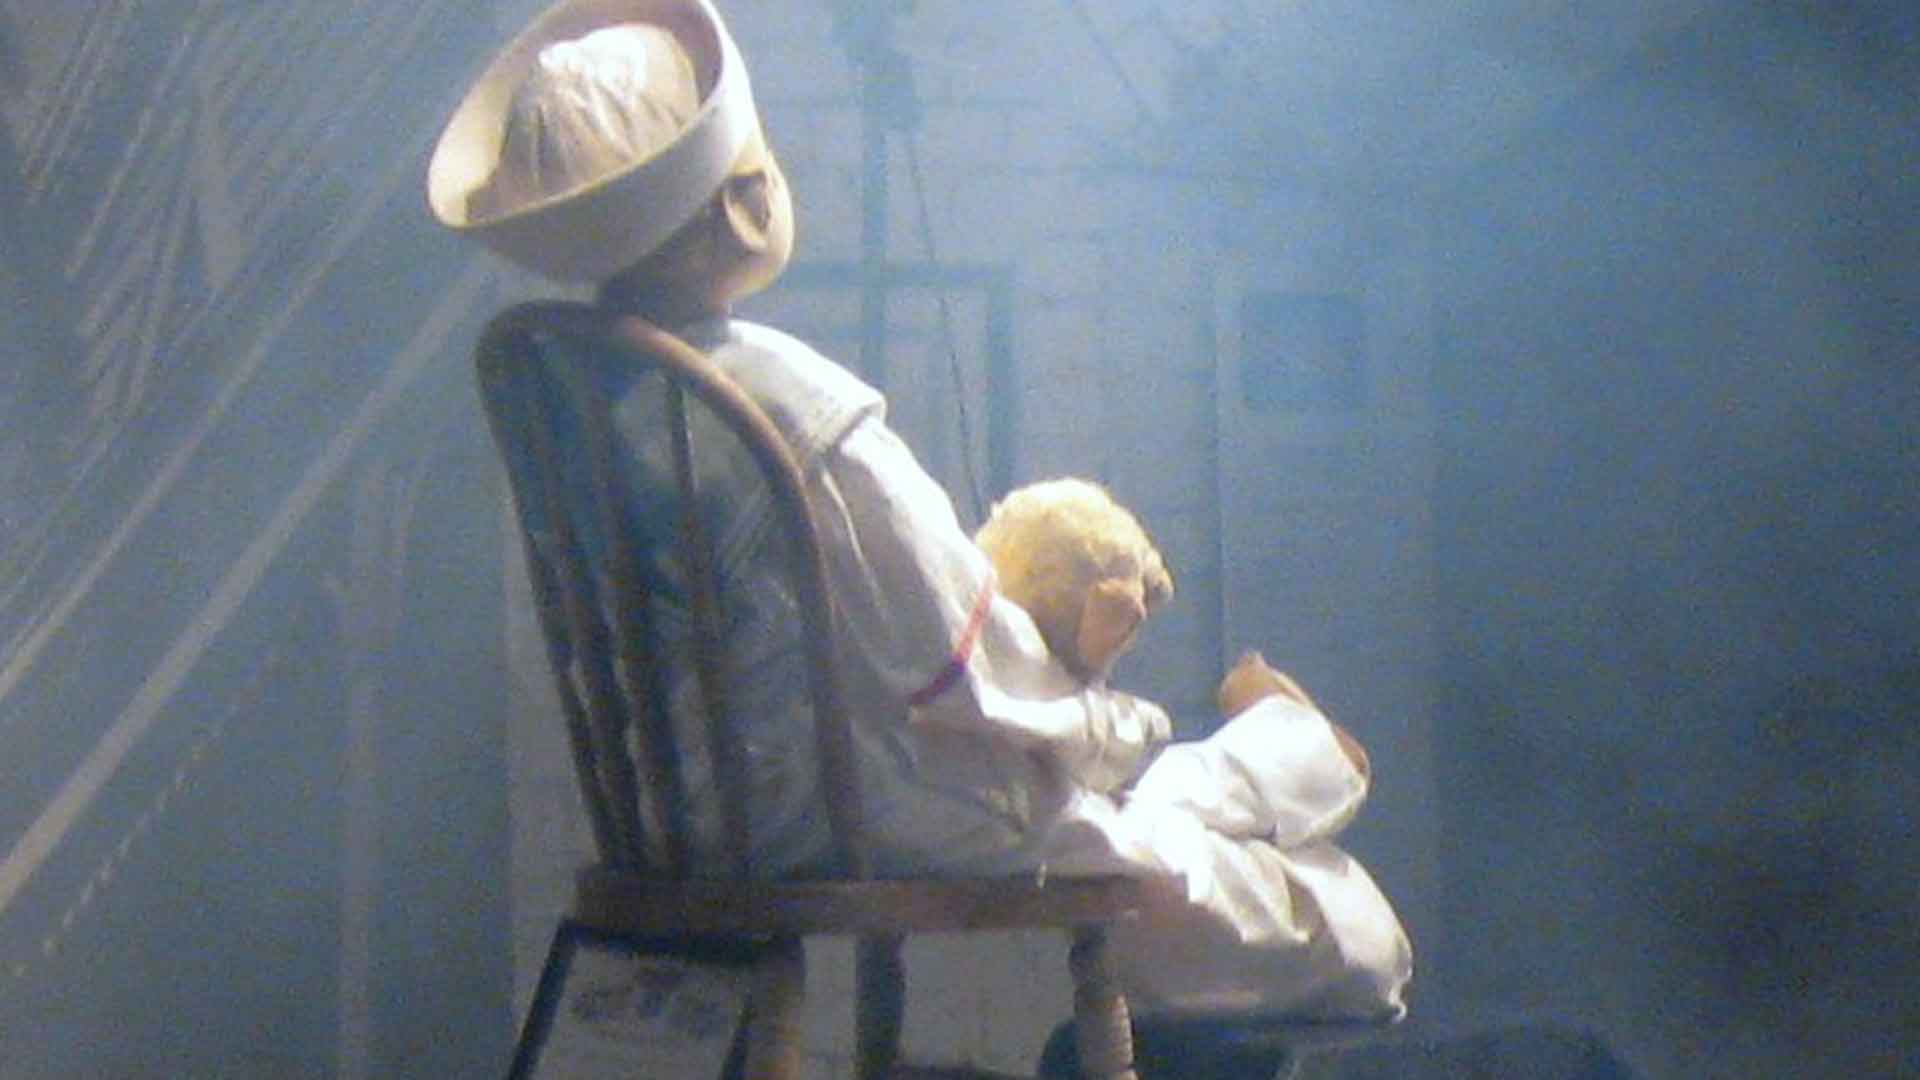 key west robert the doll